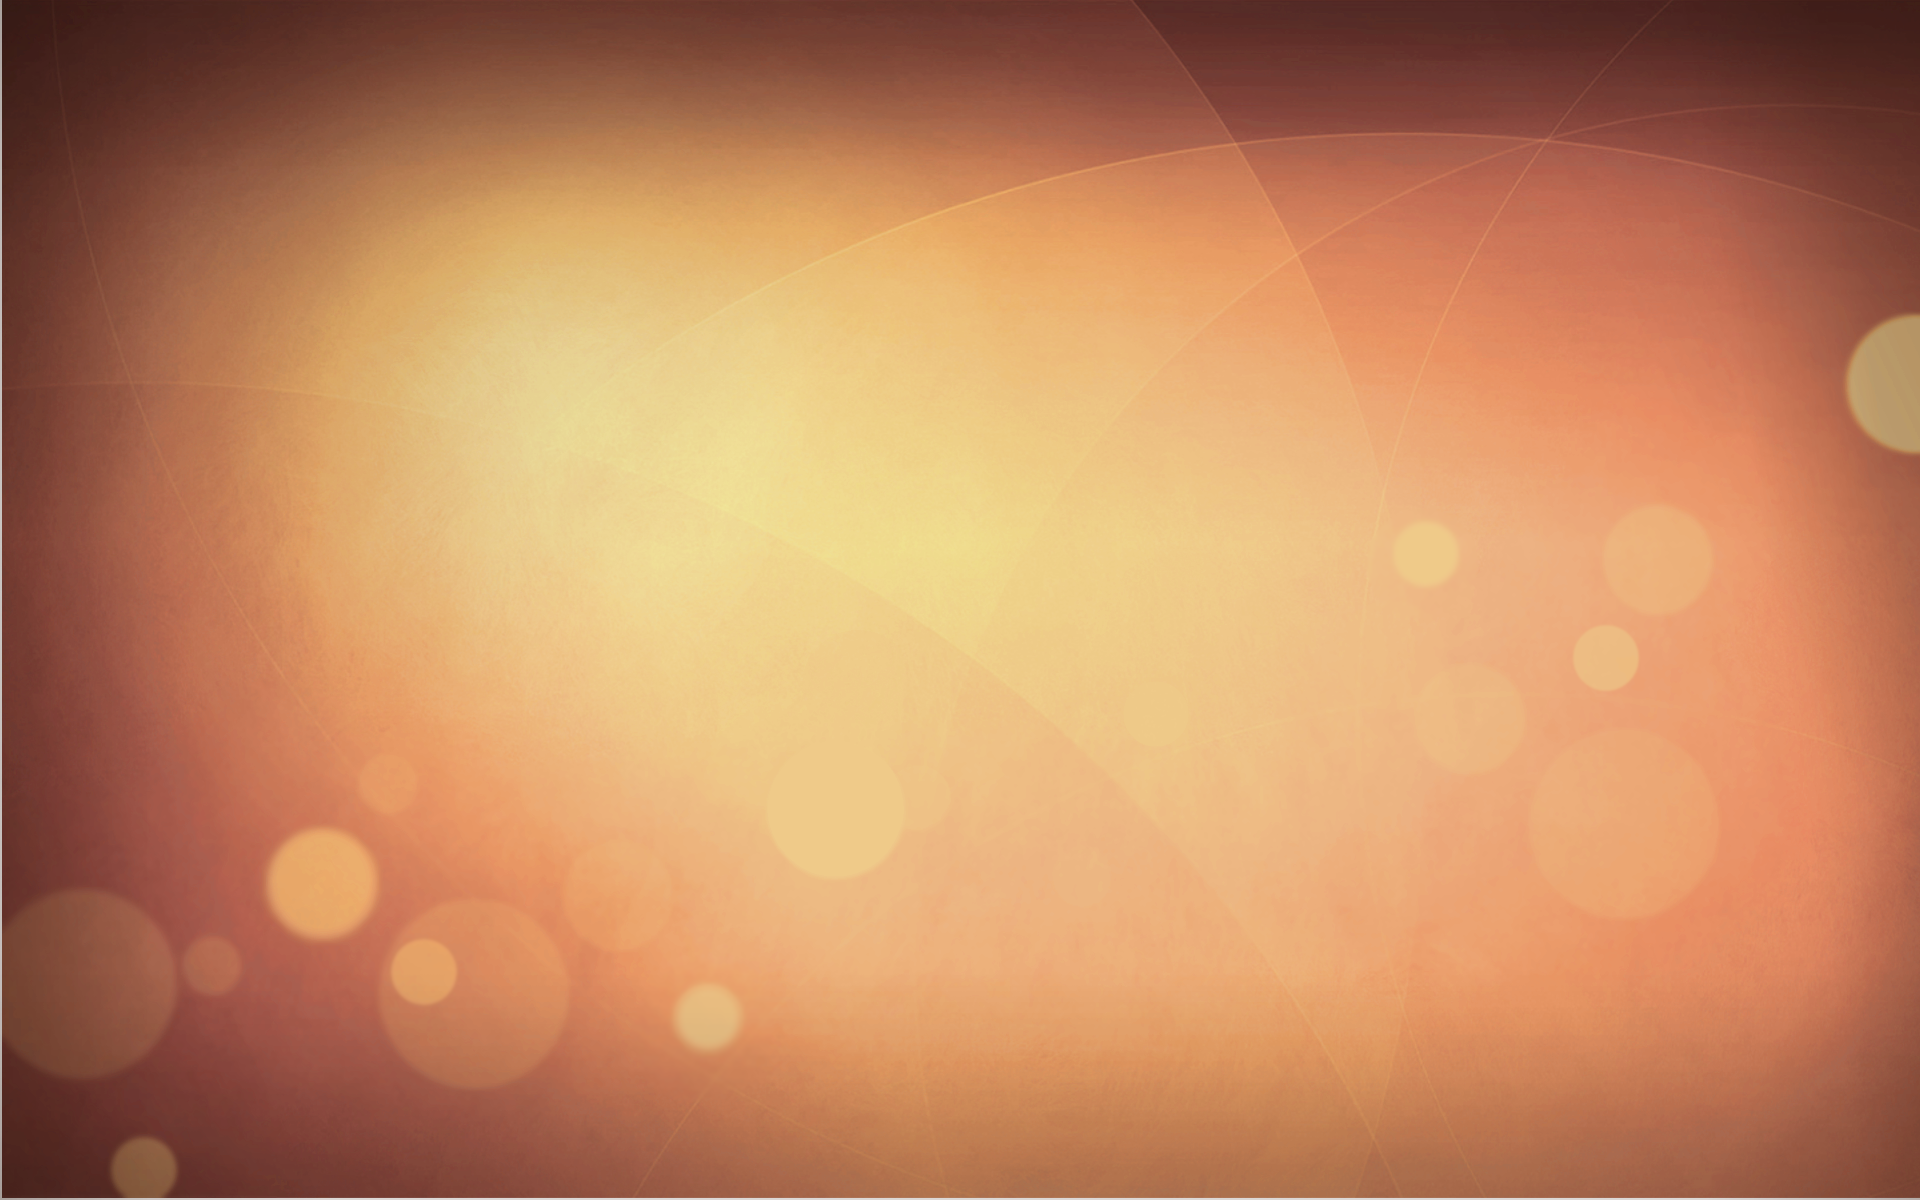 Ubuntu Wallpaper 1920x1200